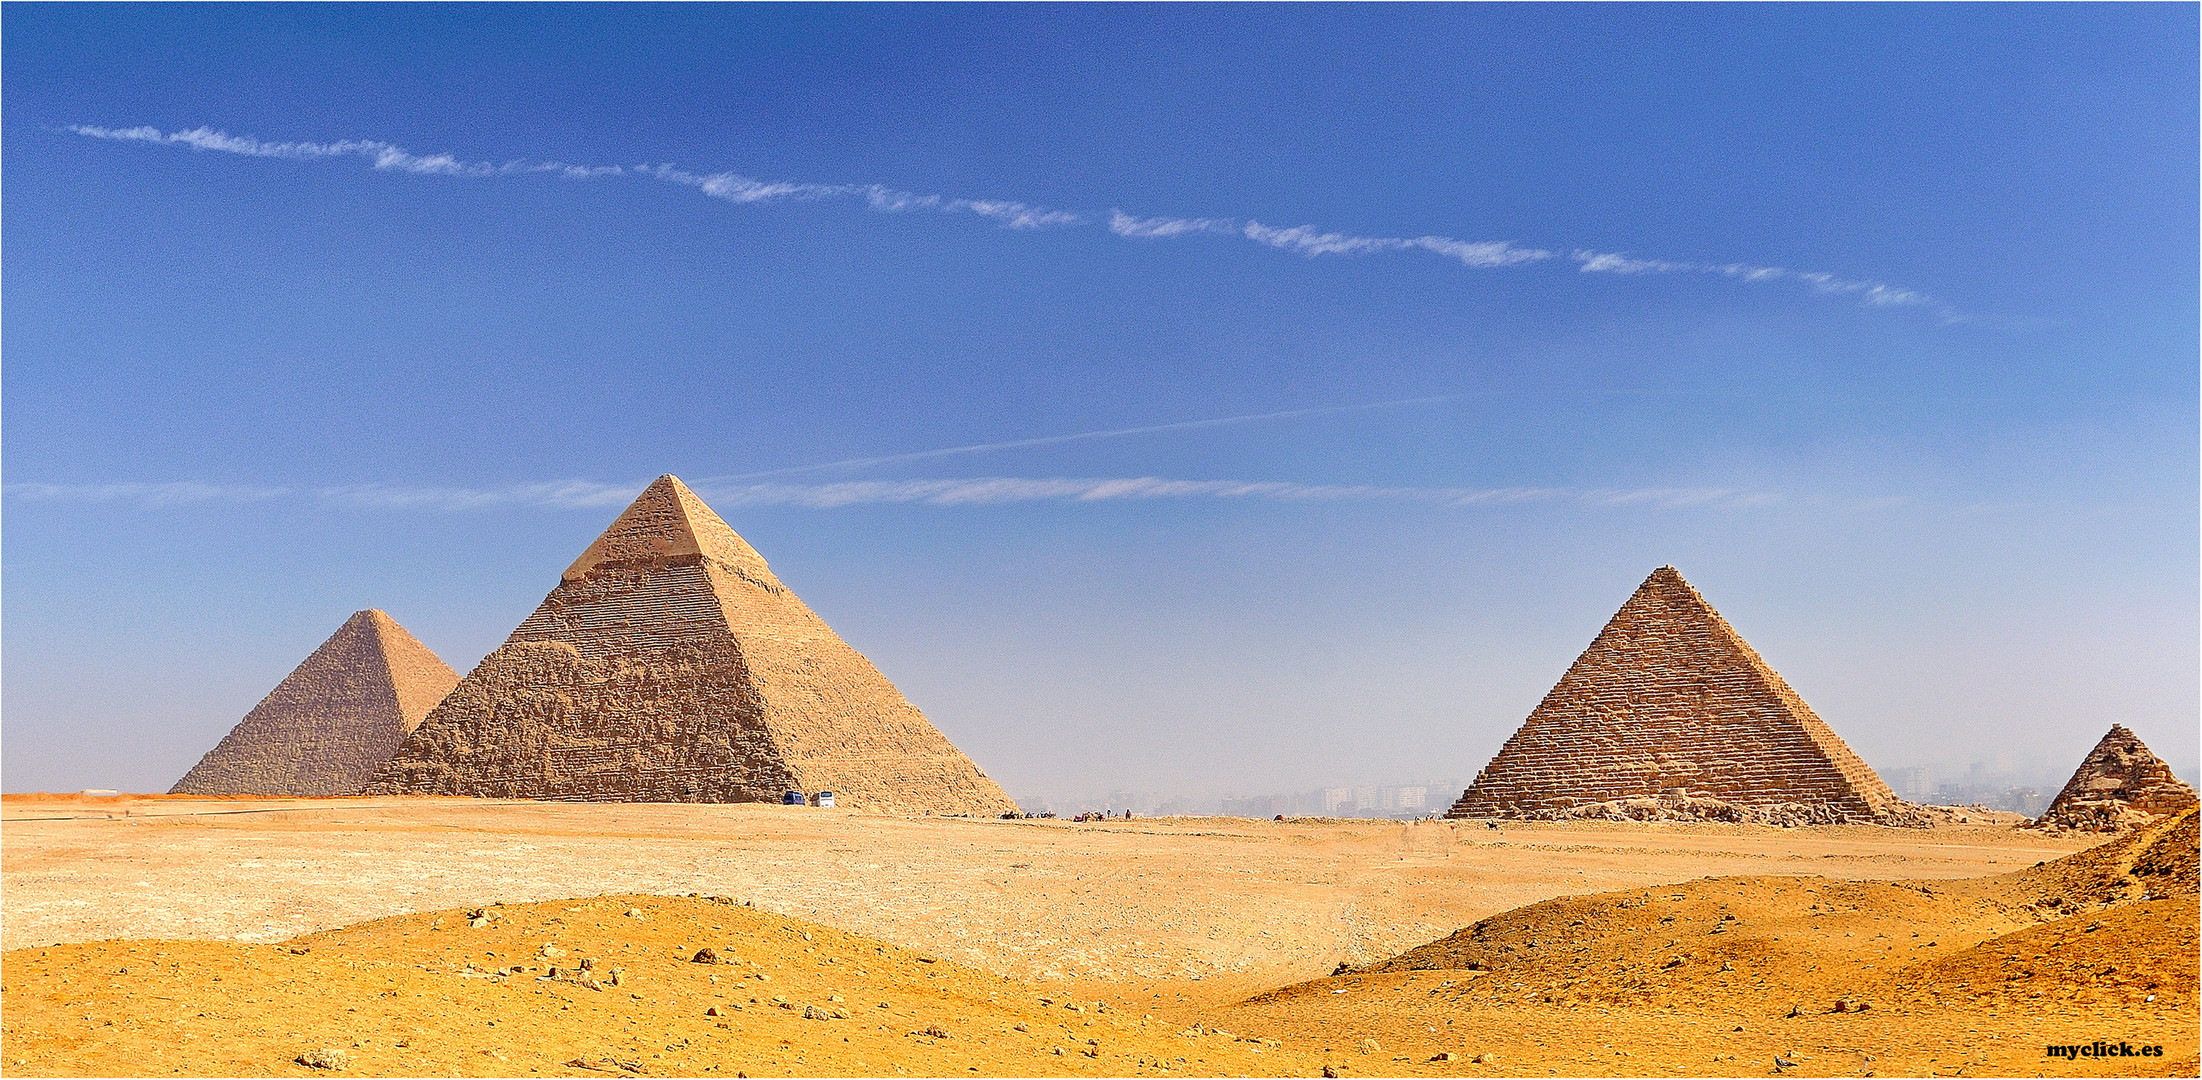 LAS PIRAMIDES DE GUIZA -EGIPTO